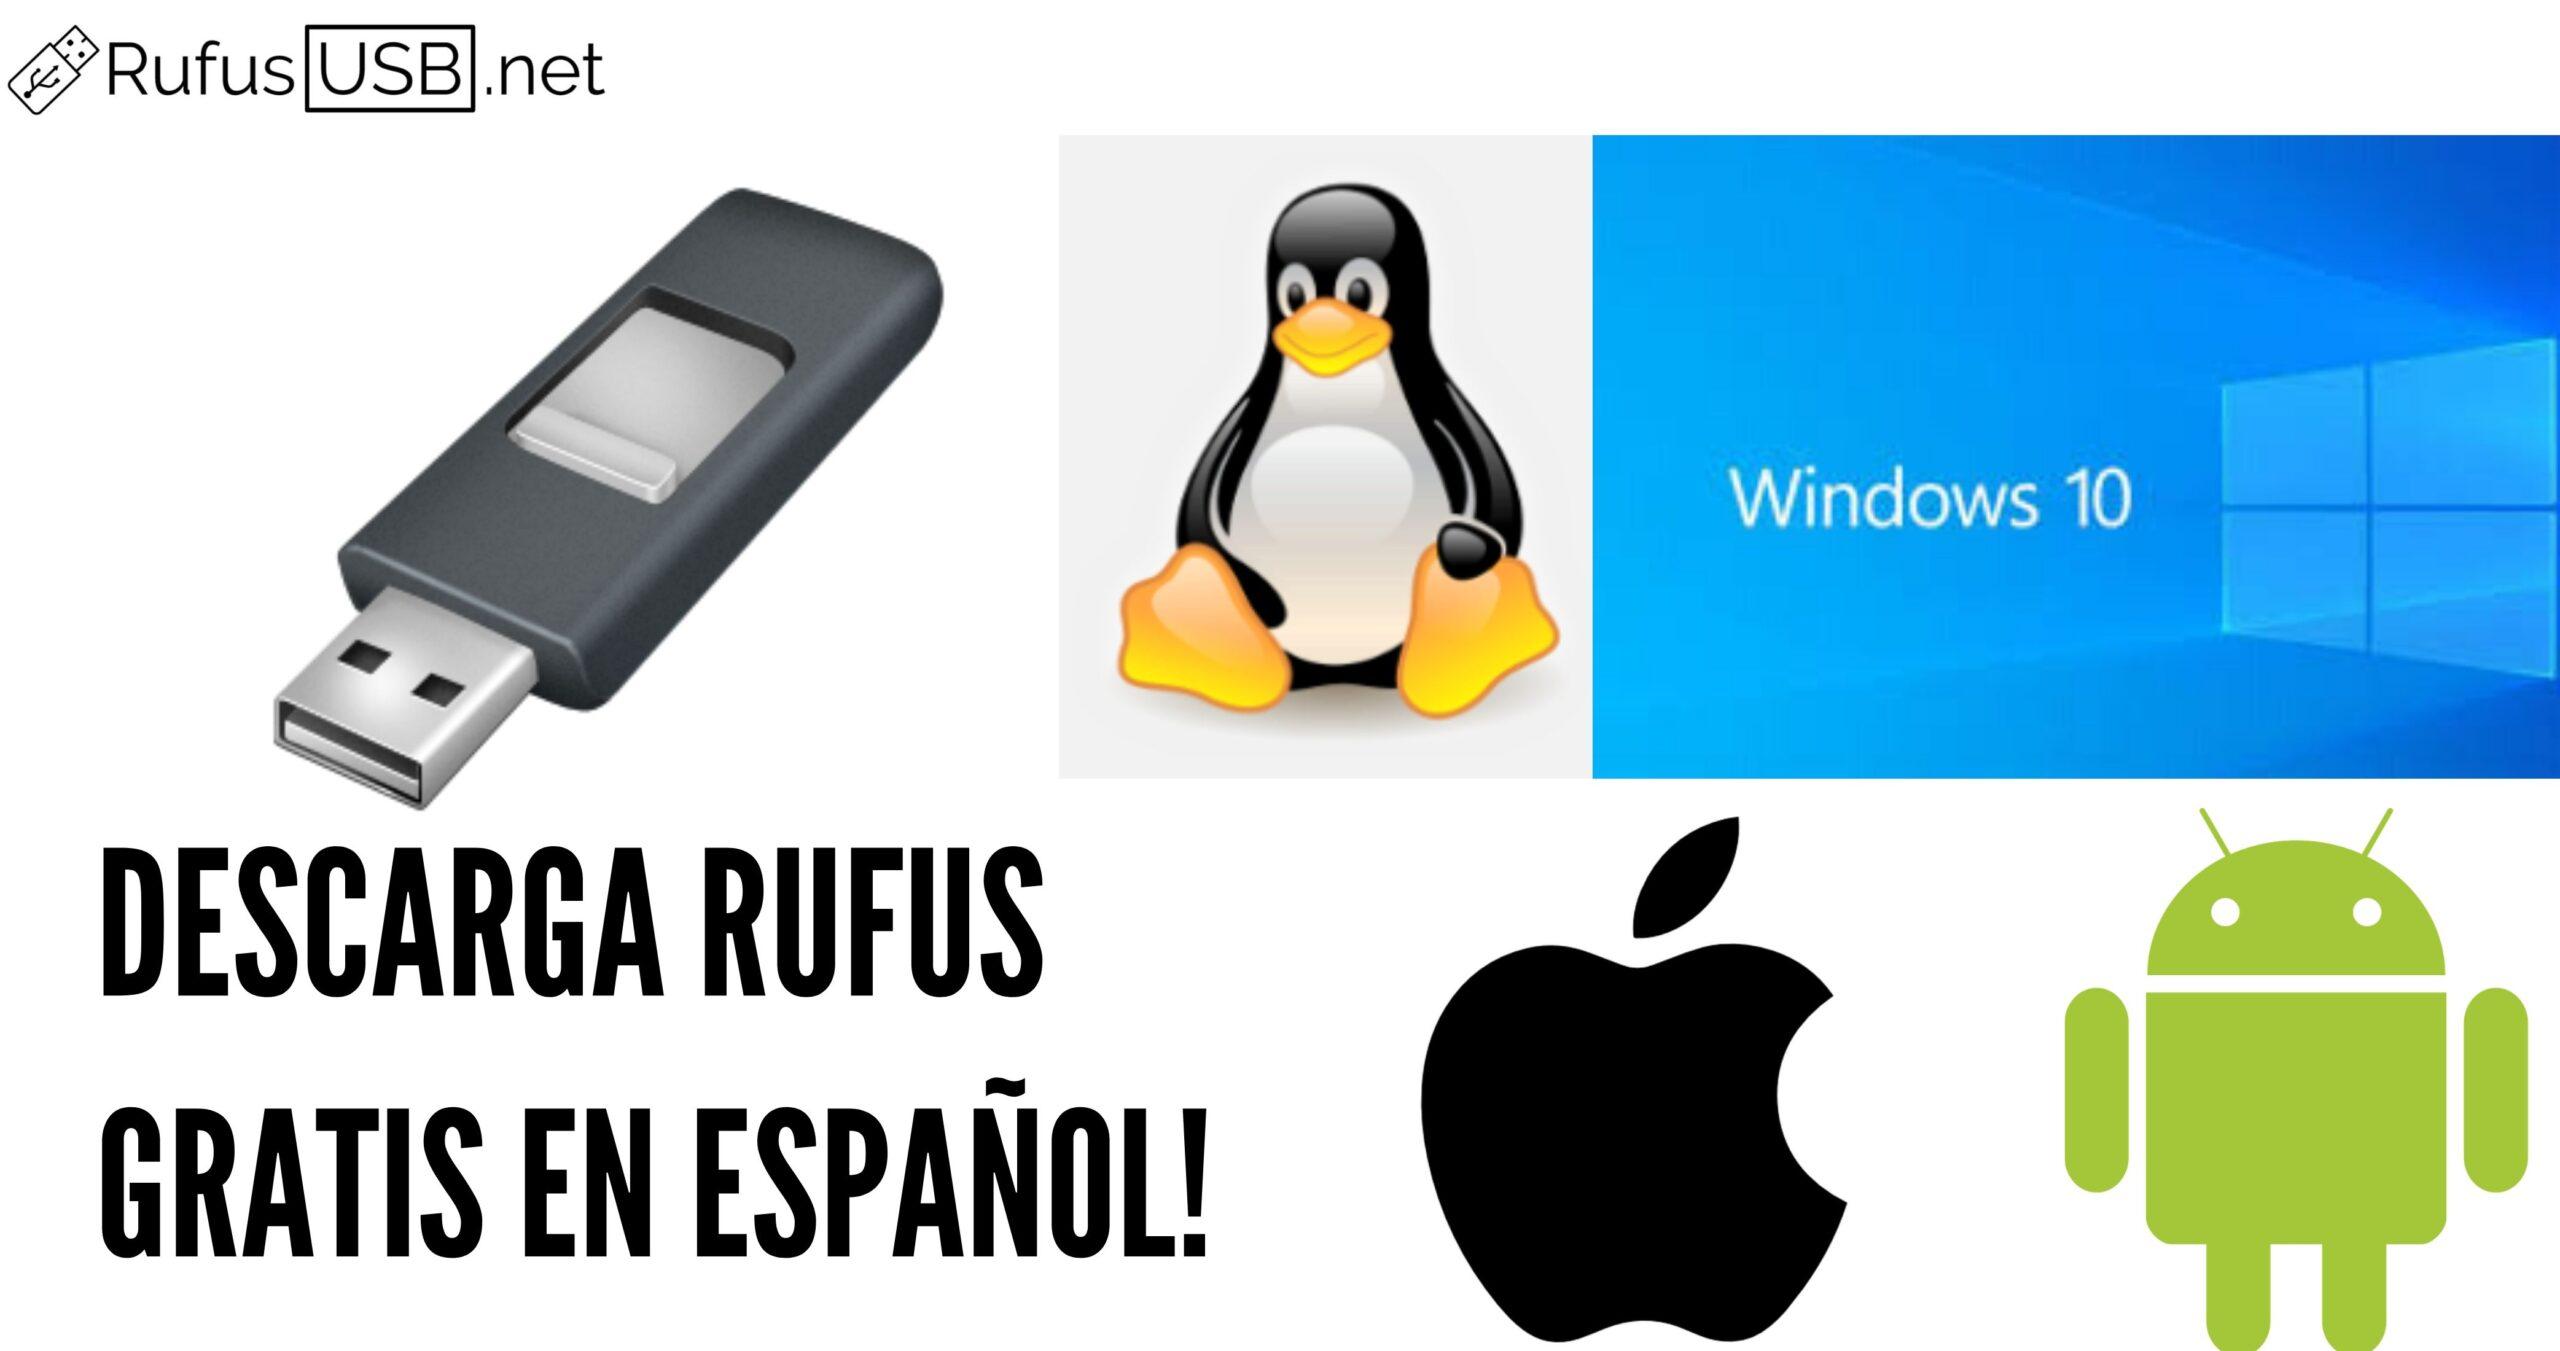 descargar rufus español gratis